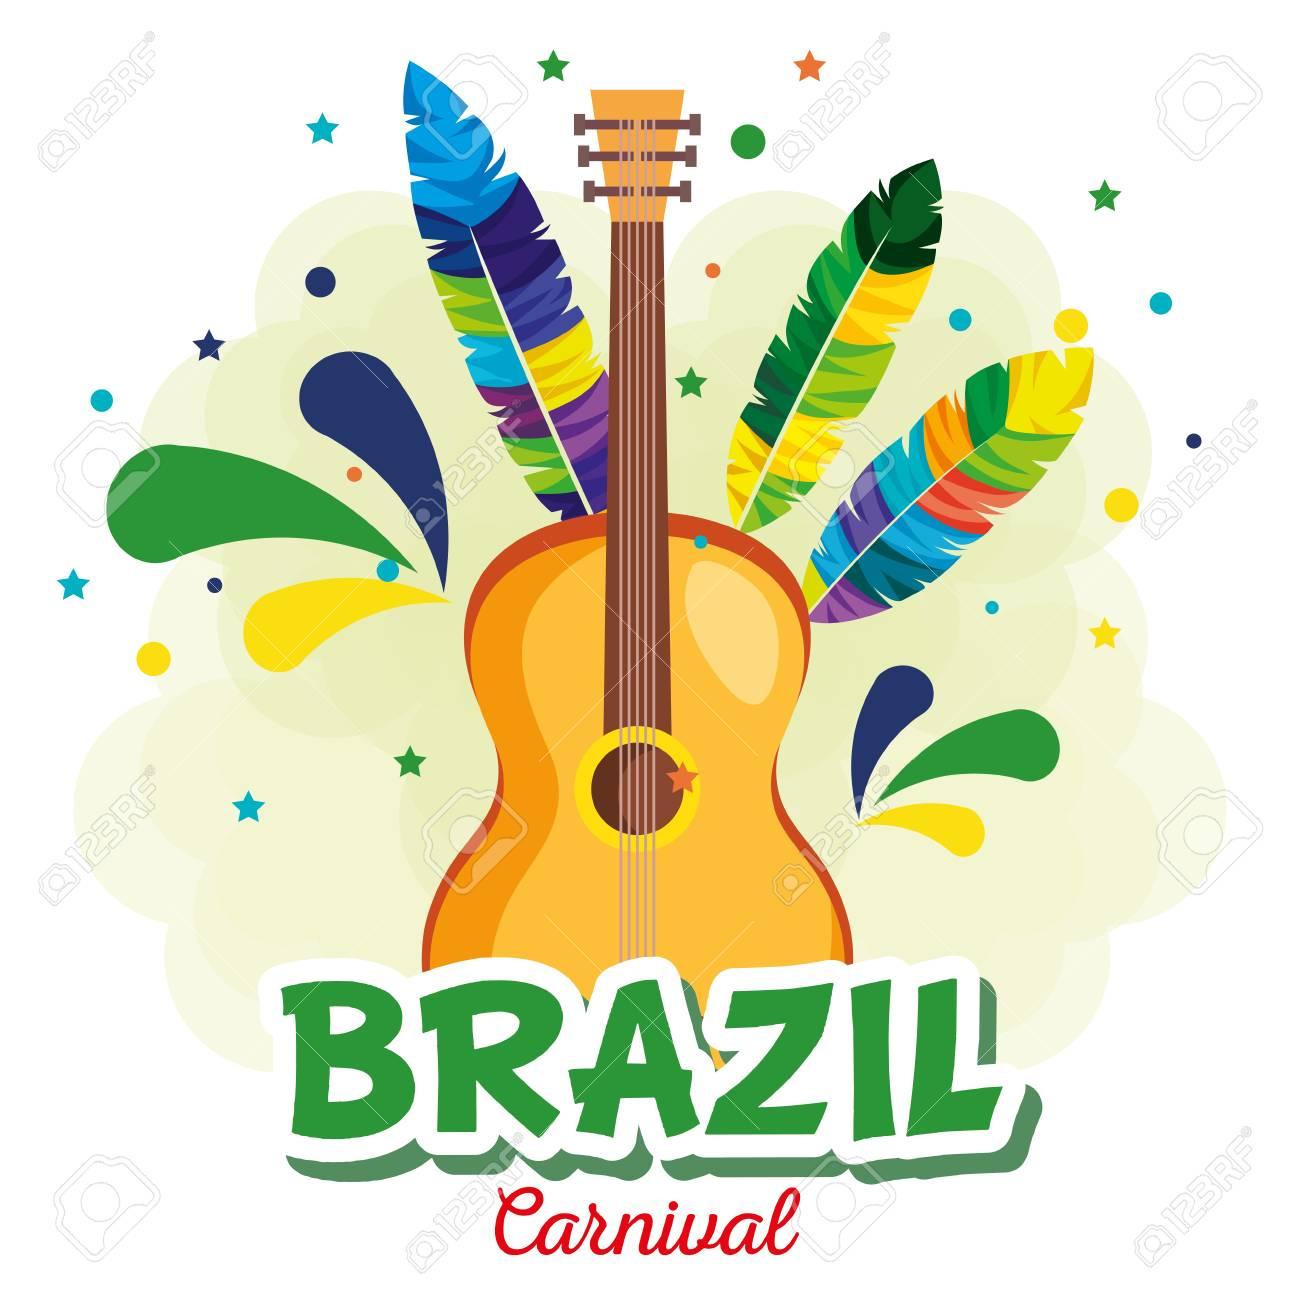 carnival brazilian card vector illustration design - 116297544